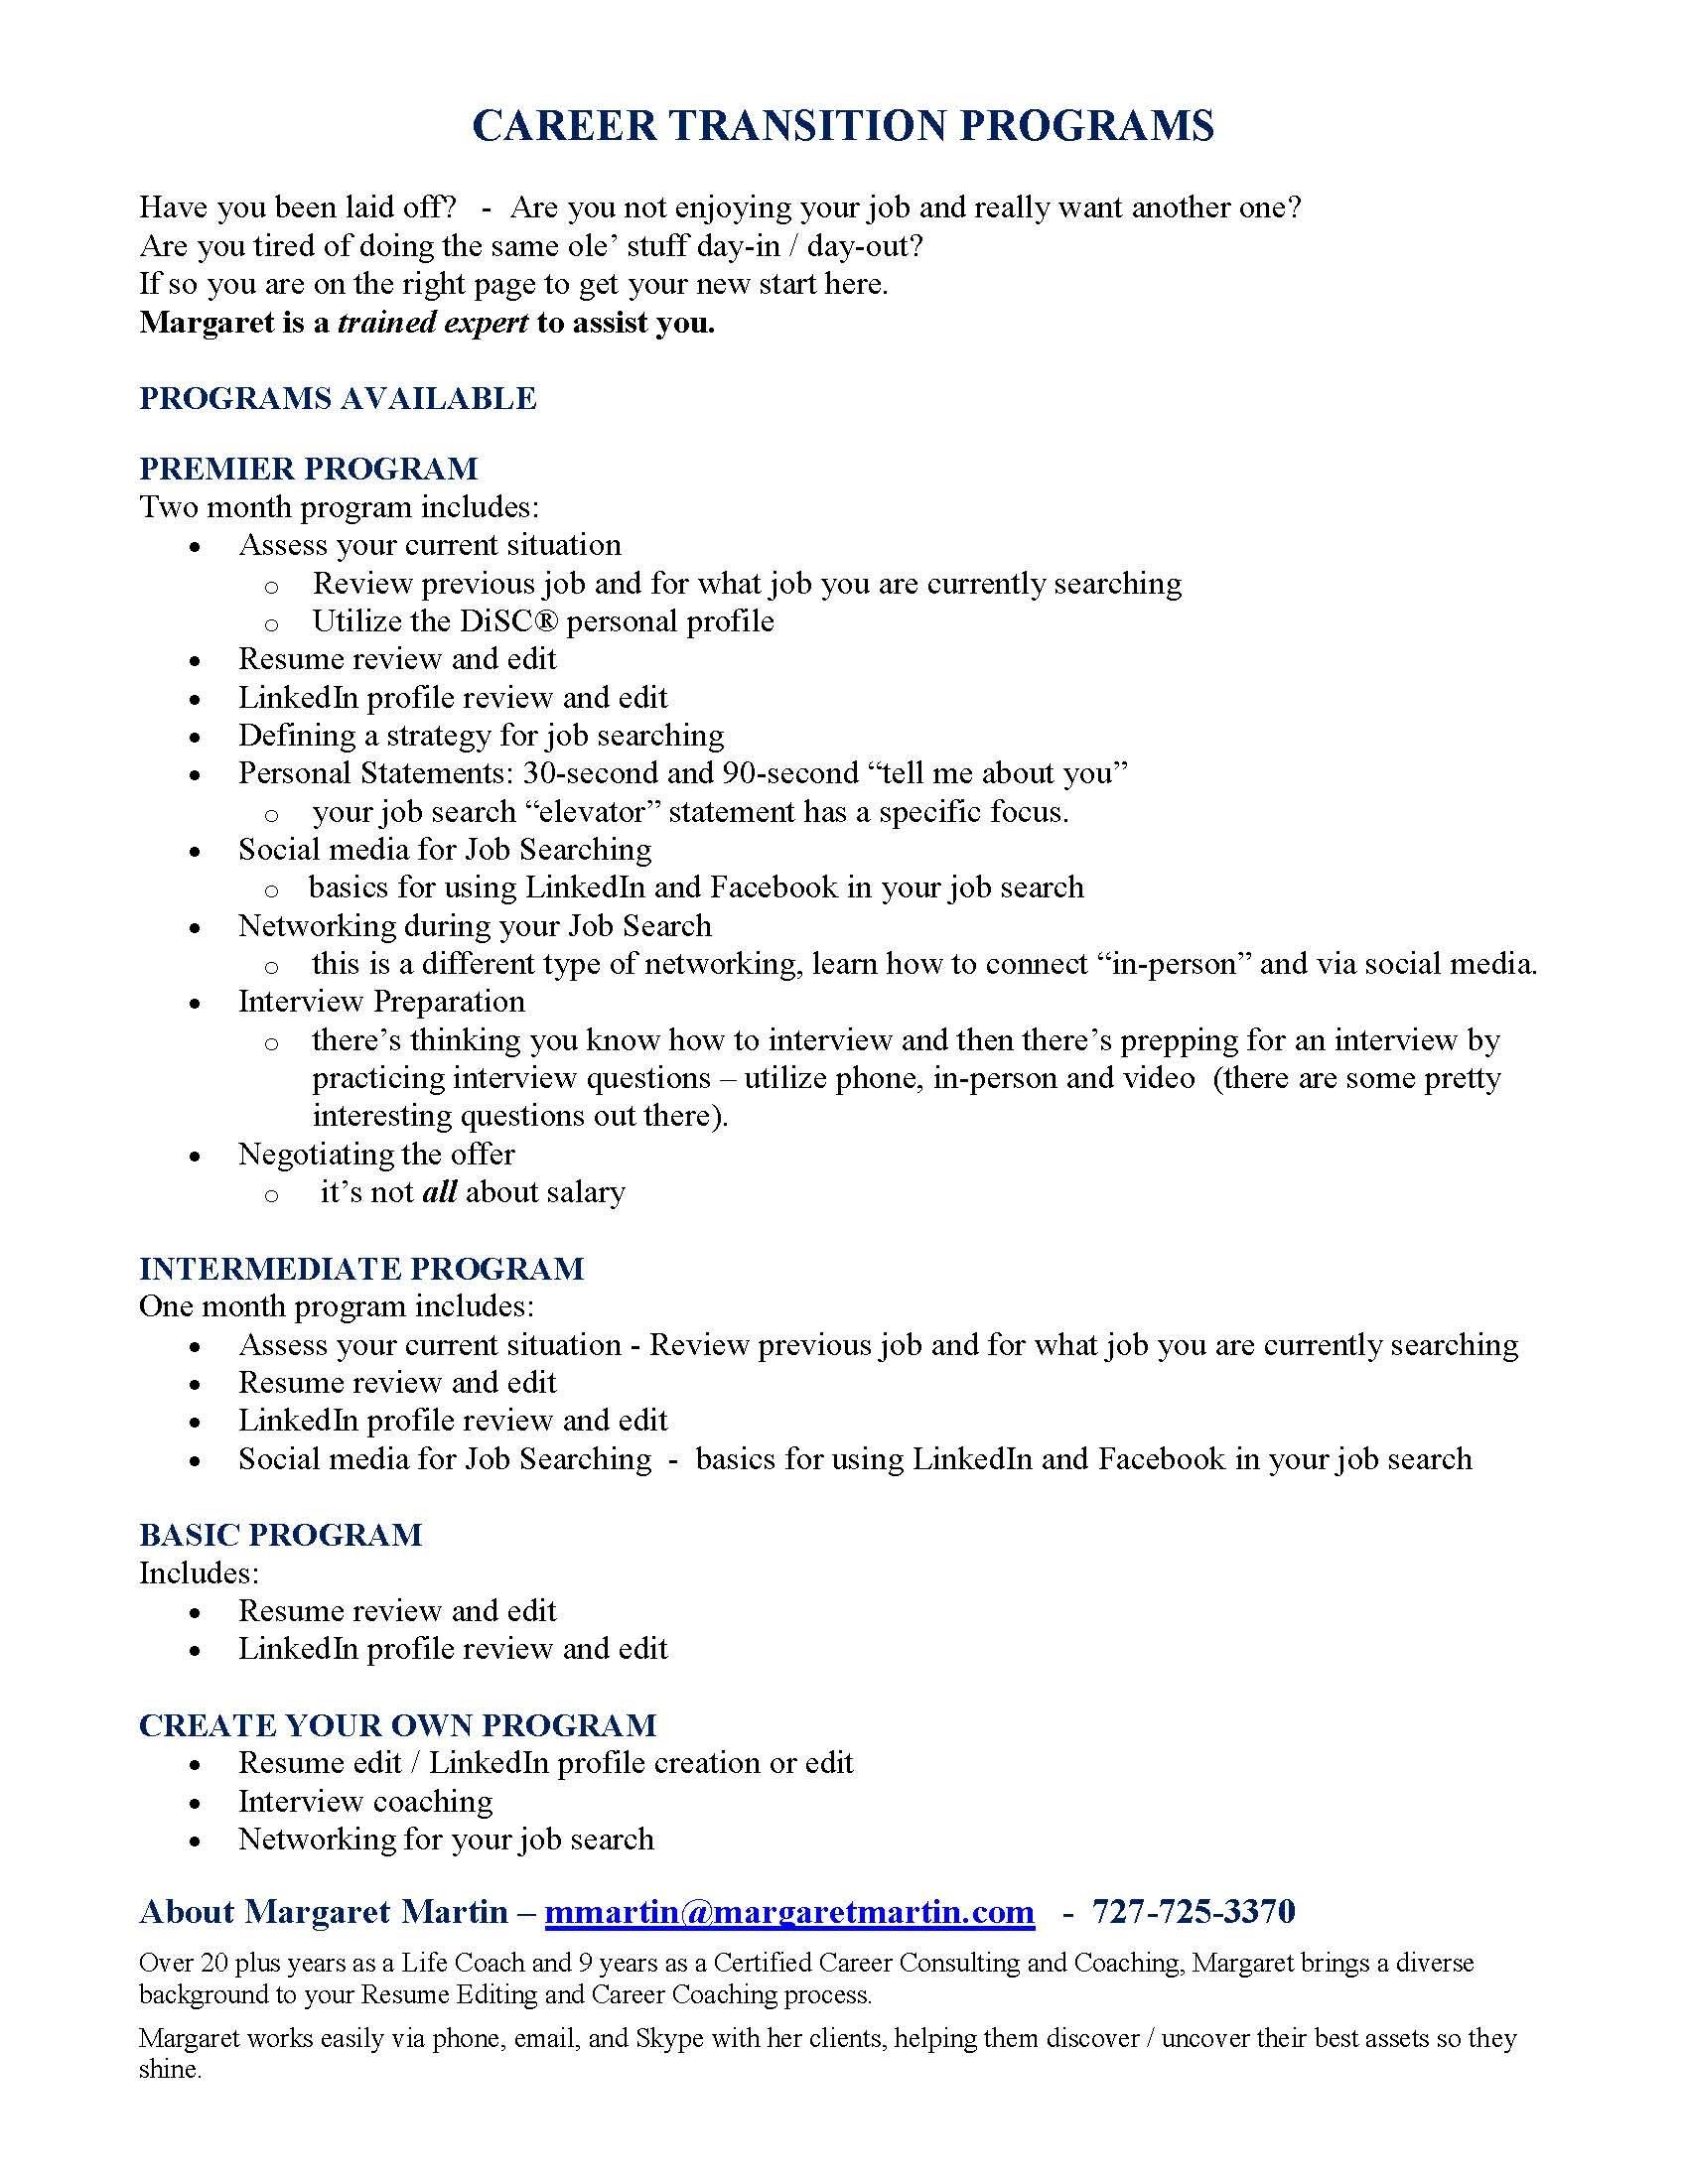 cover letter for editing job - Teriz.yasamayolver.com